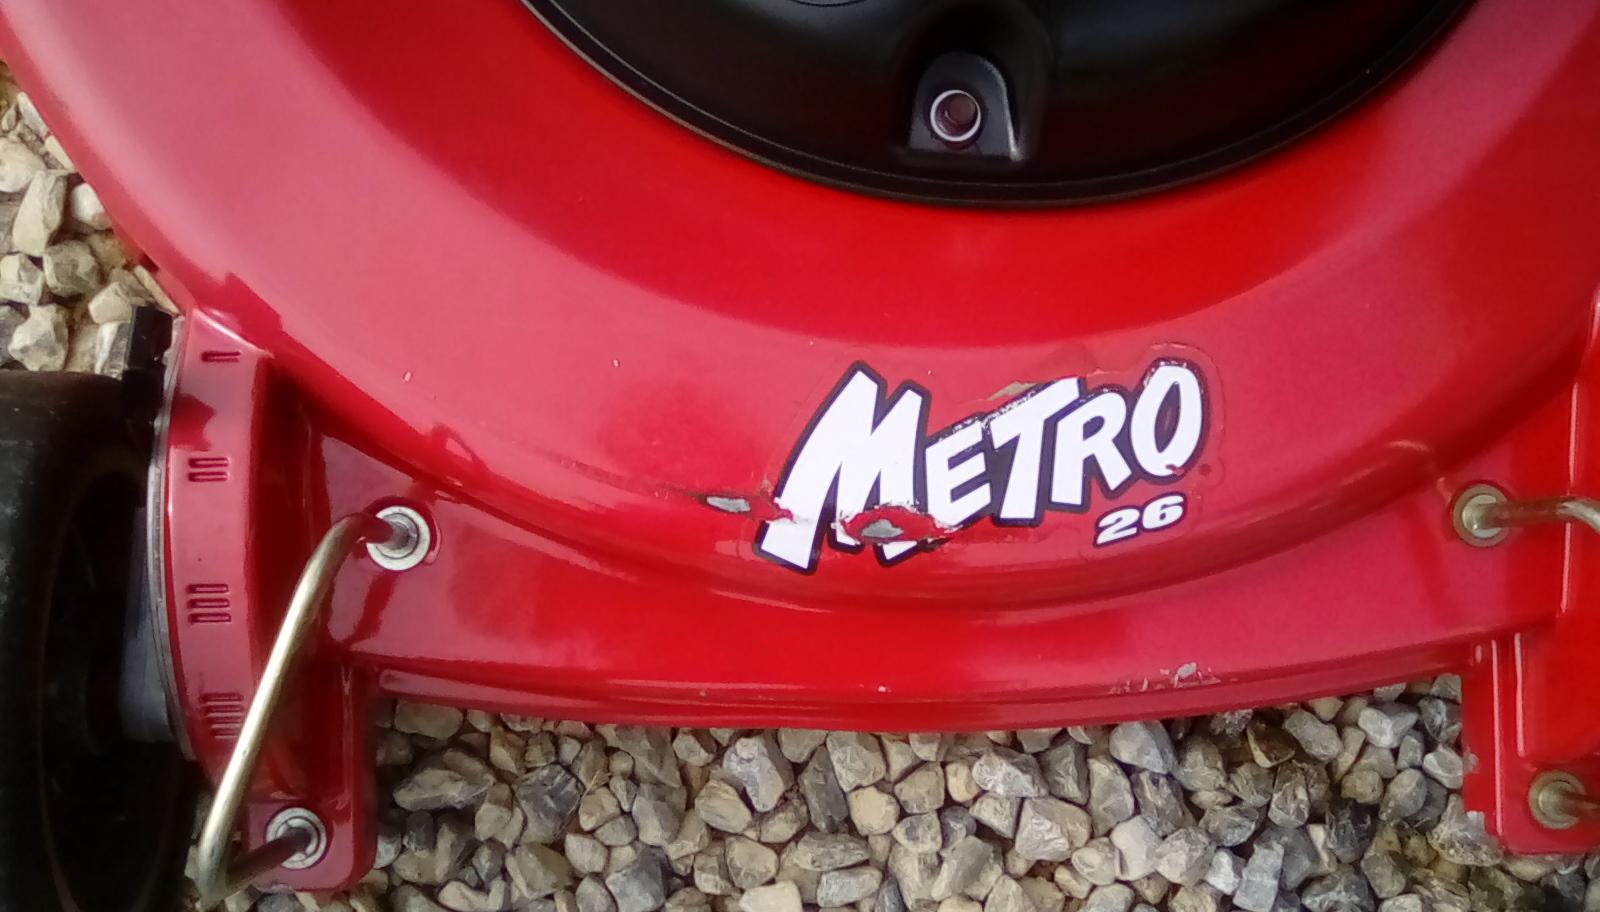 EXMARK METRO 26 Image